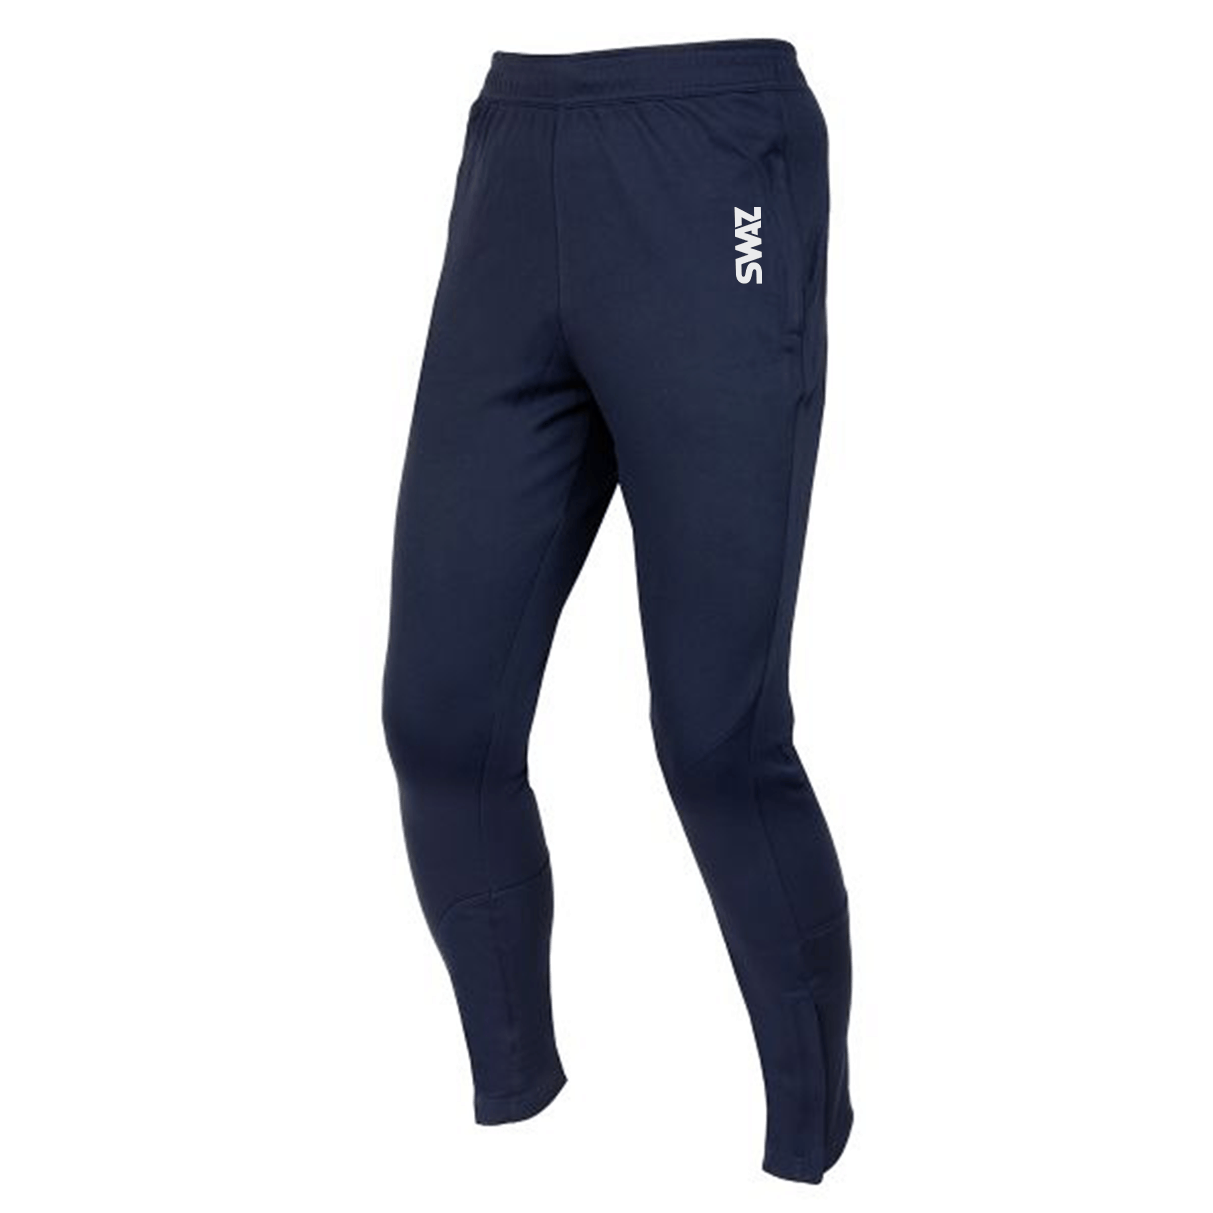 SWAZ Navy Skinny Pants | Football Teamwear